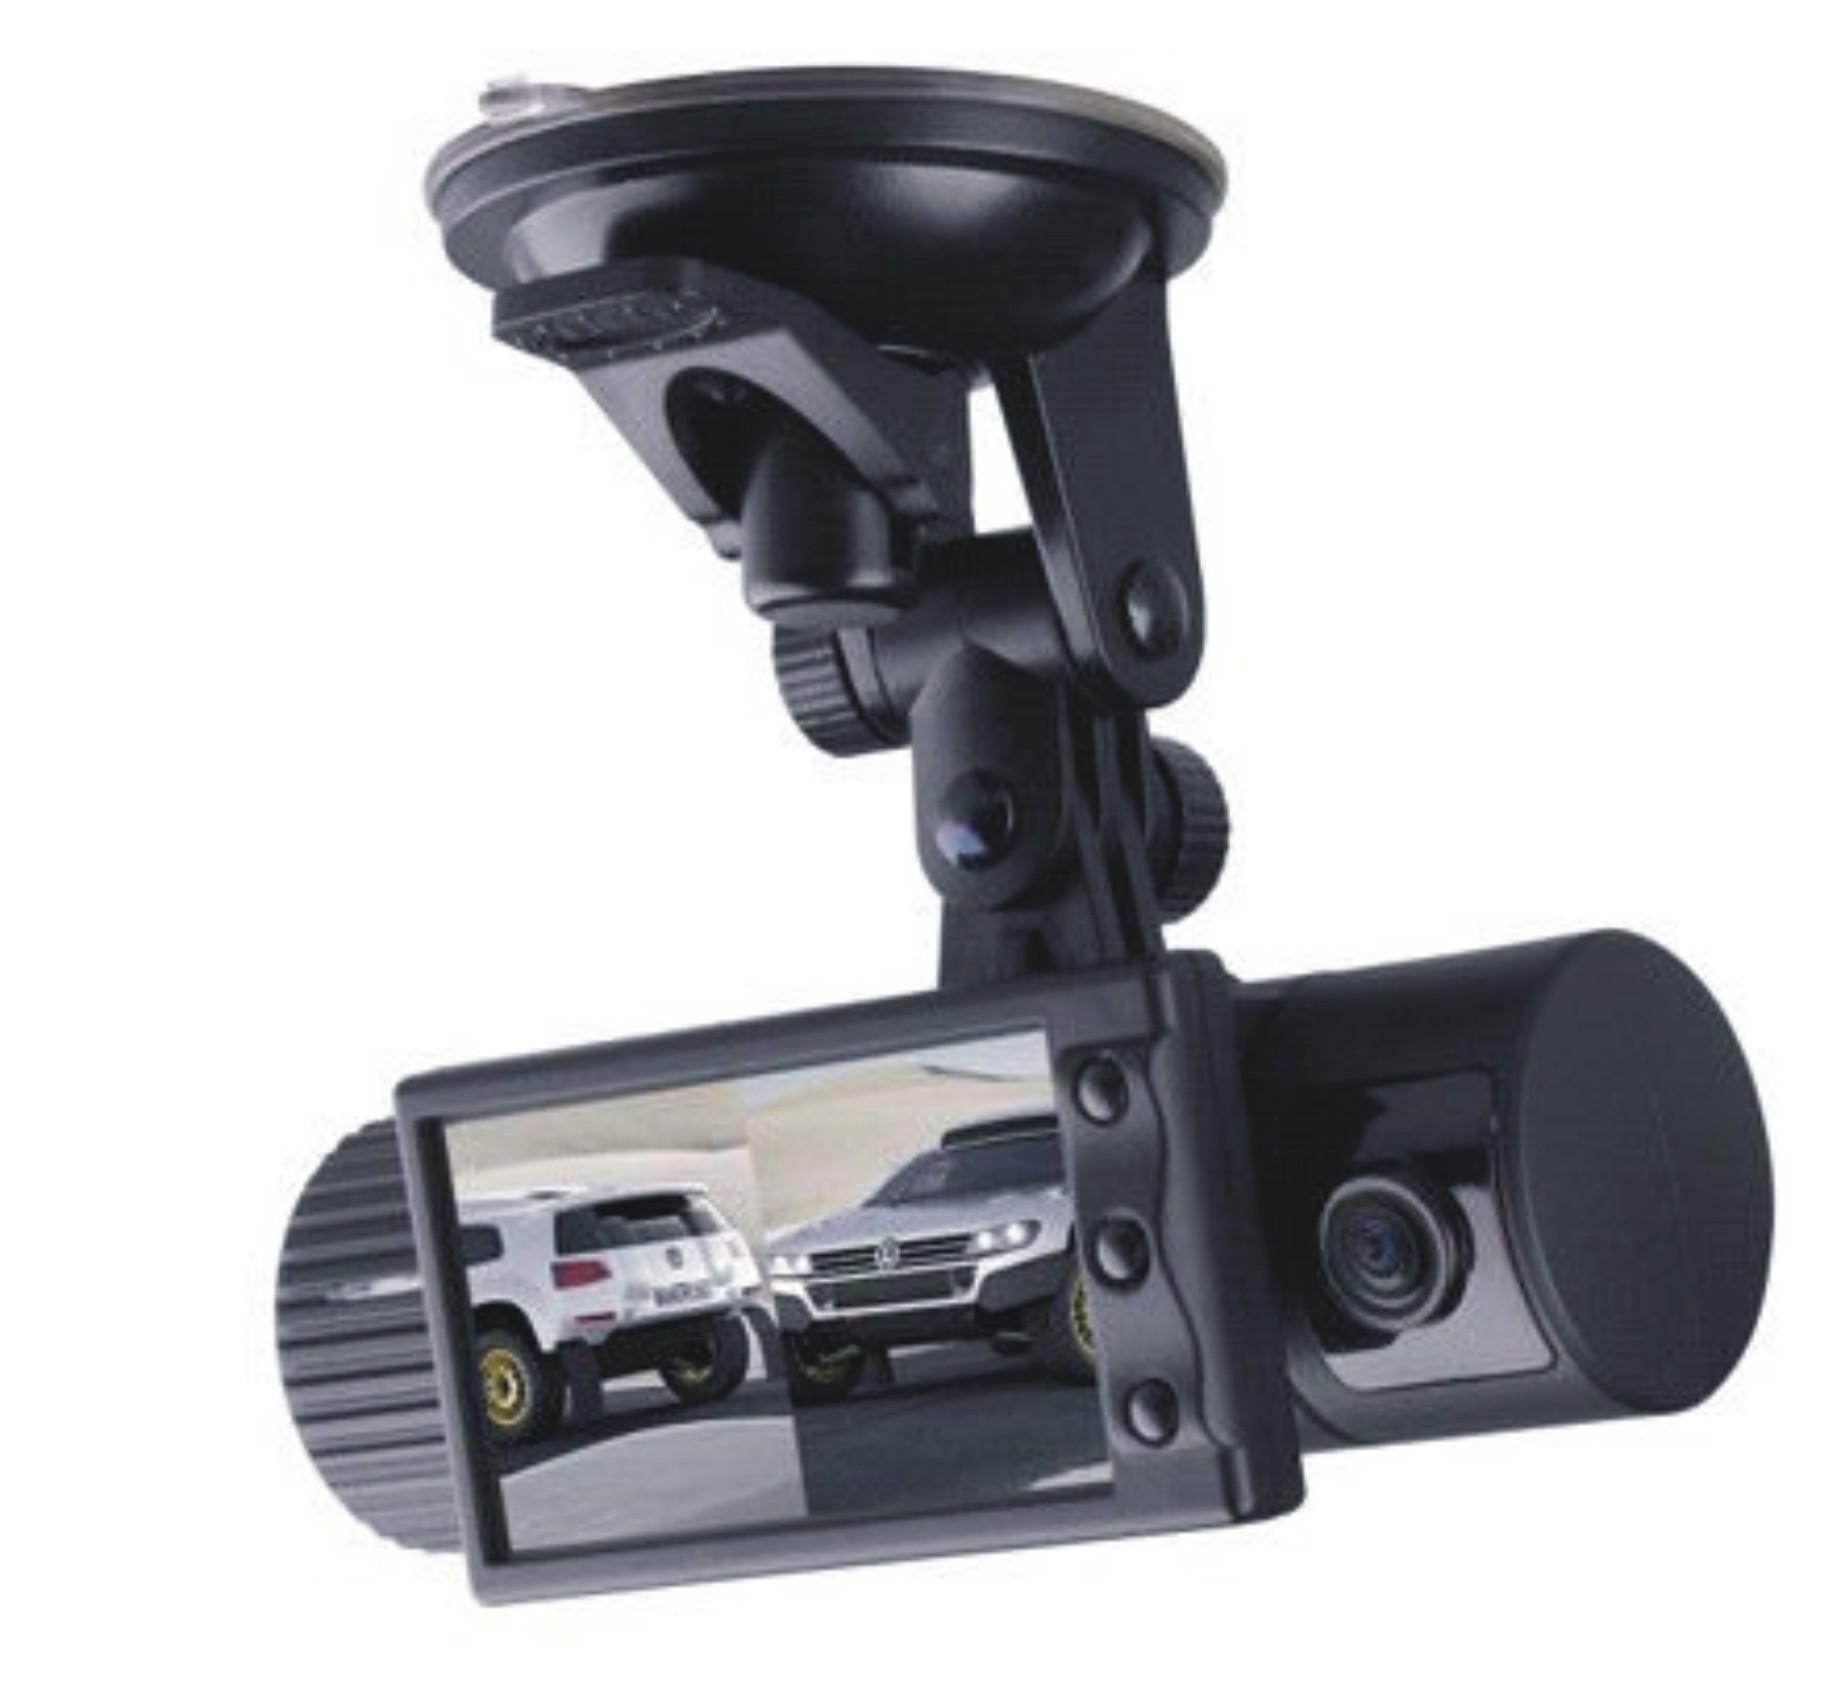 Buy Online Cheap Price Dual Lens Dashboard Camera in Mumbai